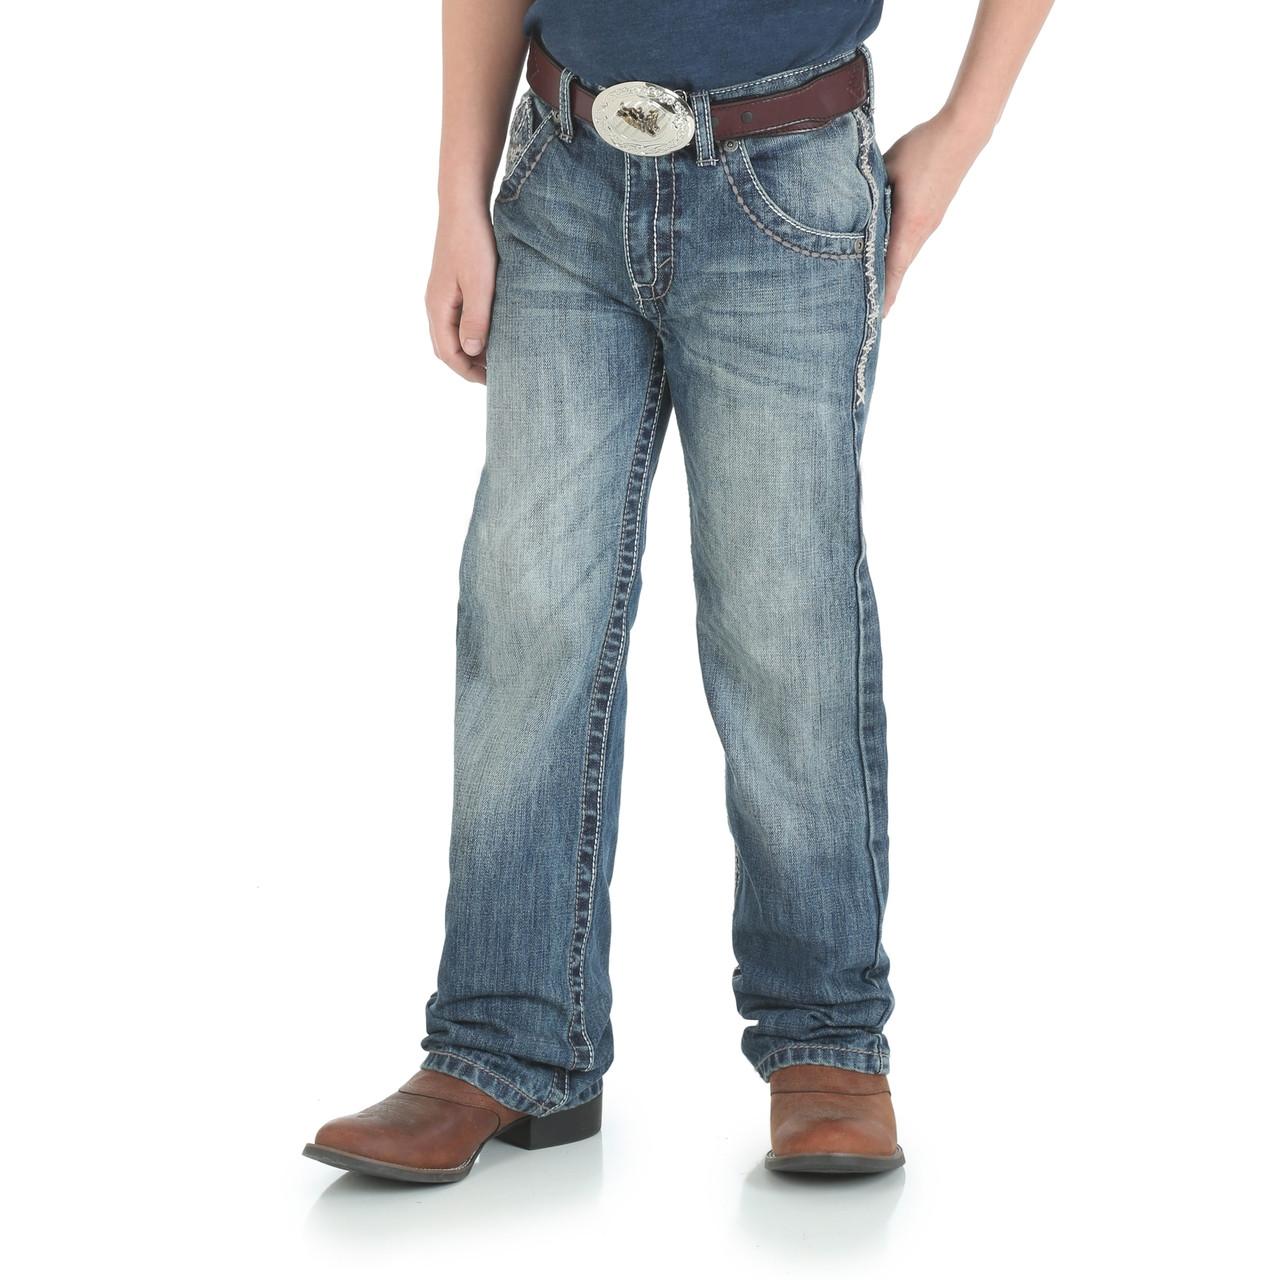 6a45e4d2f8 42BWXBB Wrangler 20X Vintage Boot Jeans Big Boys 8-16 - Brantleys Western    Casual Wear